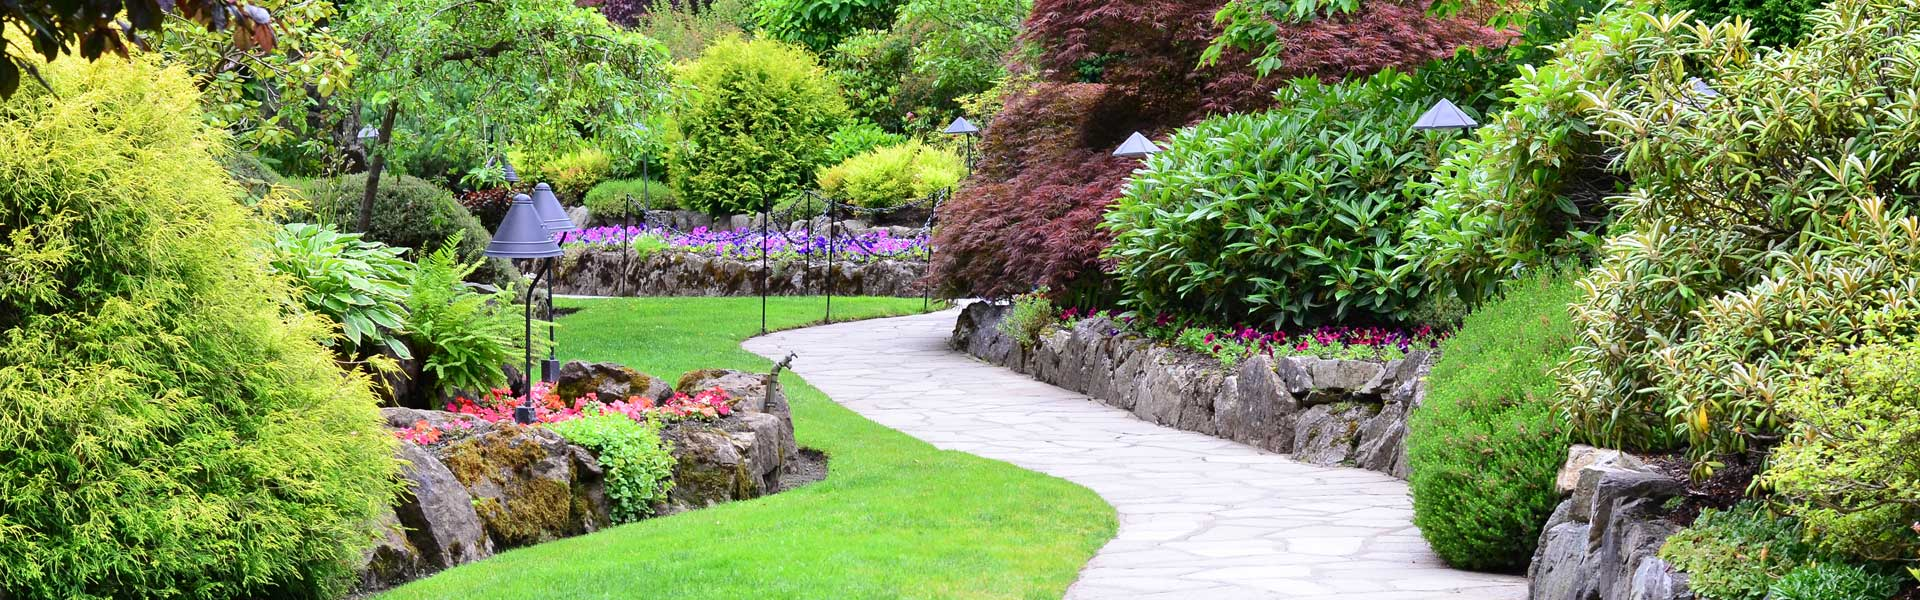 Galway Home Garden Festival